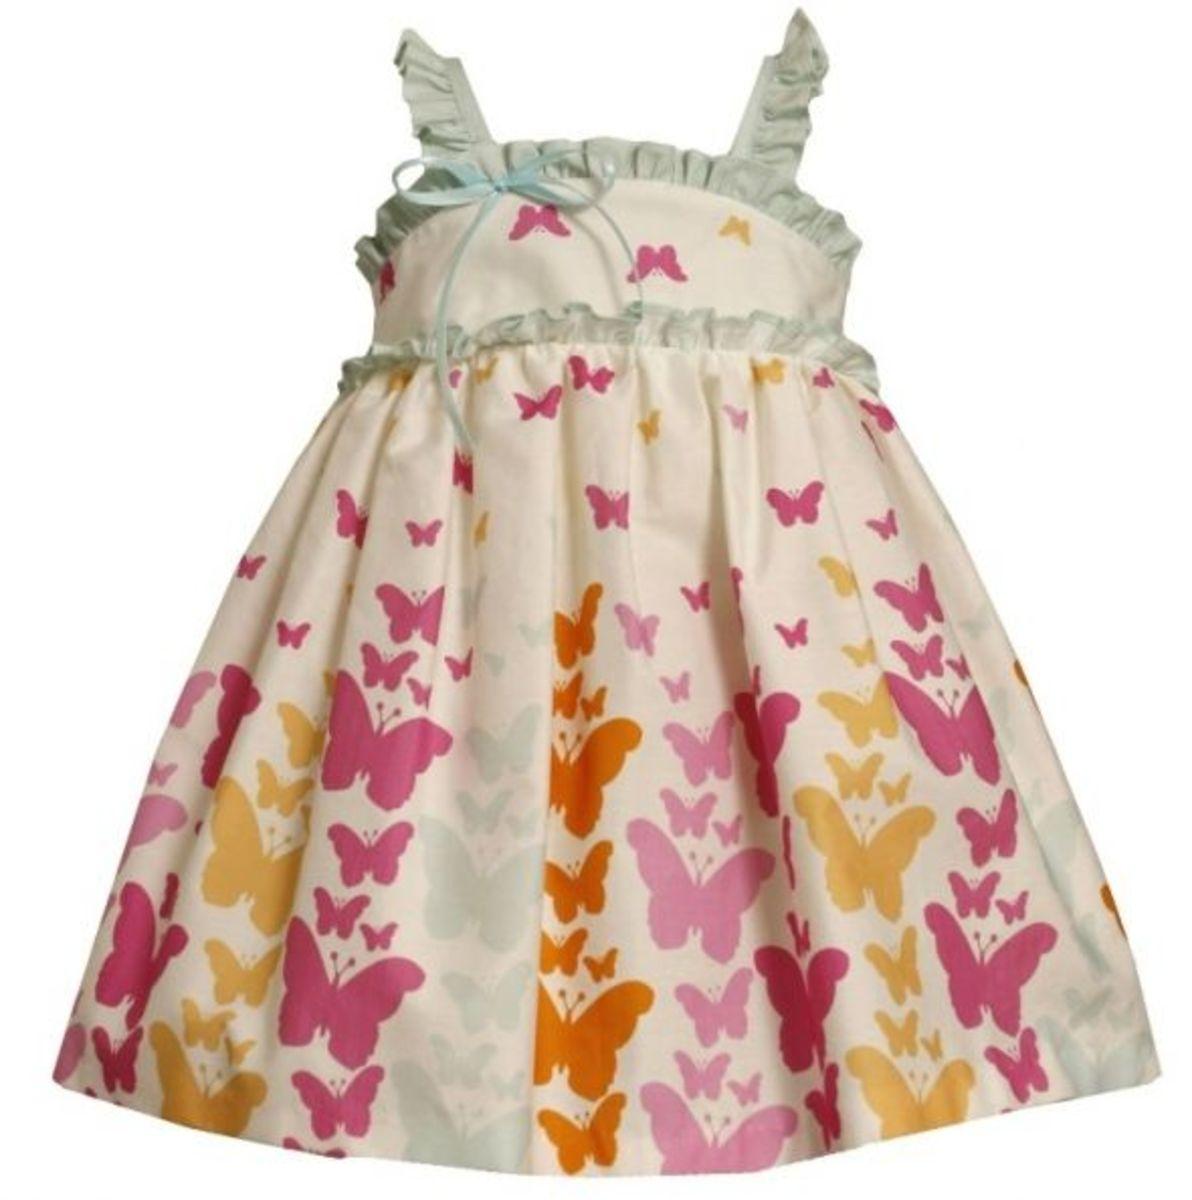 Bonnie Jean Dress With Butterflies